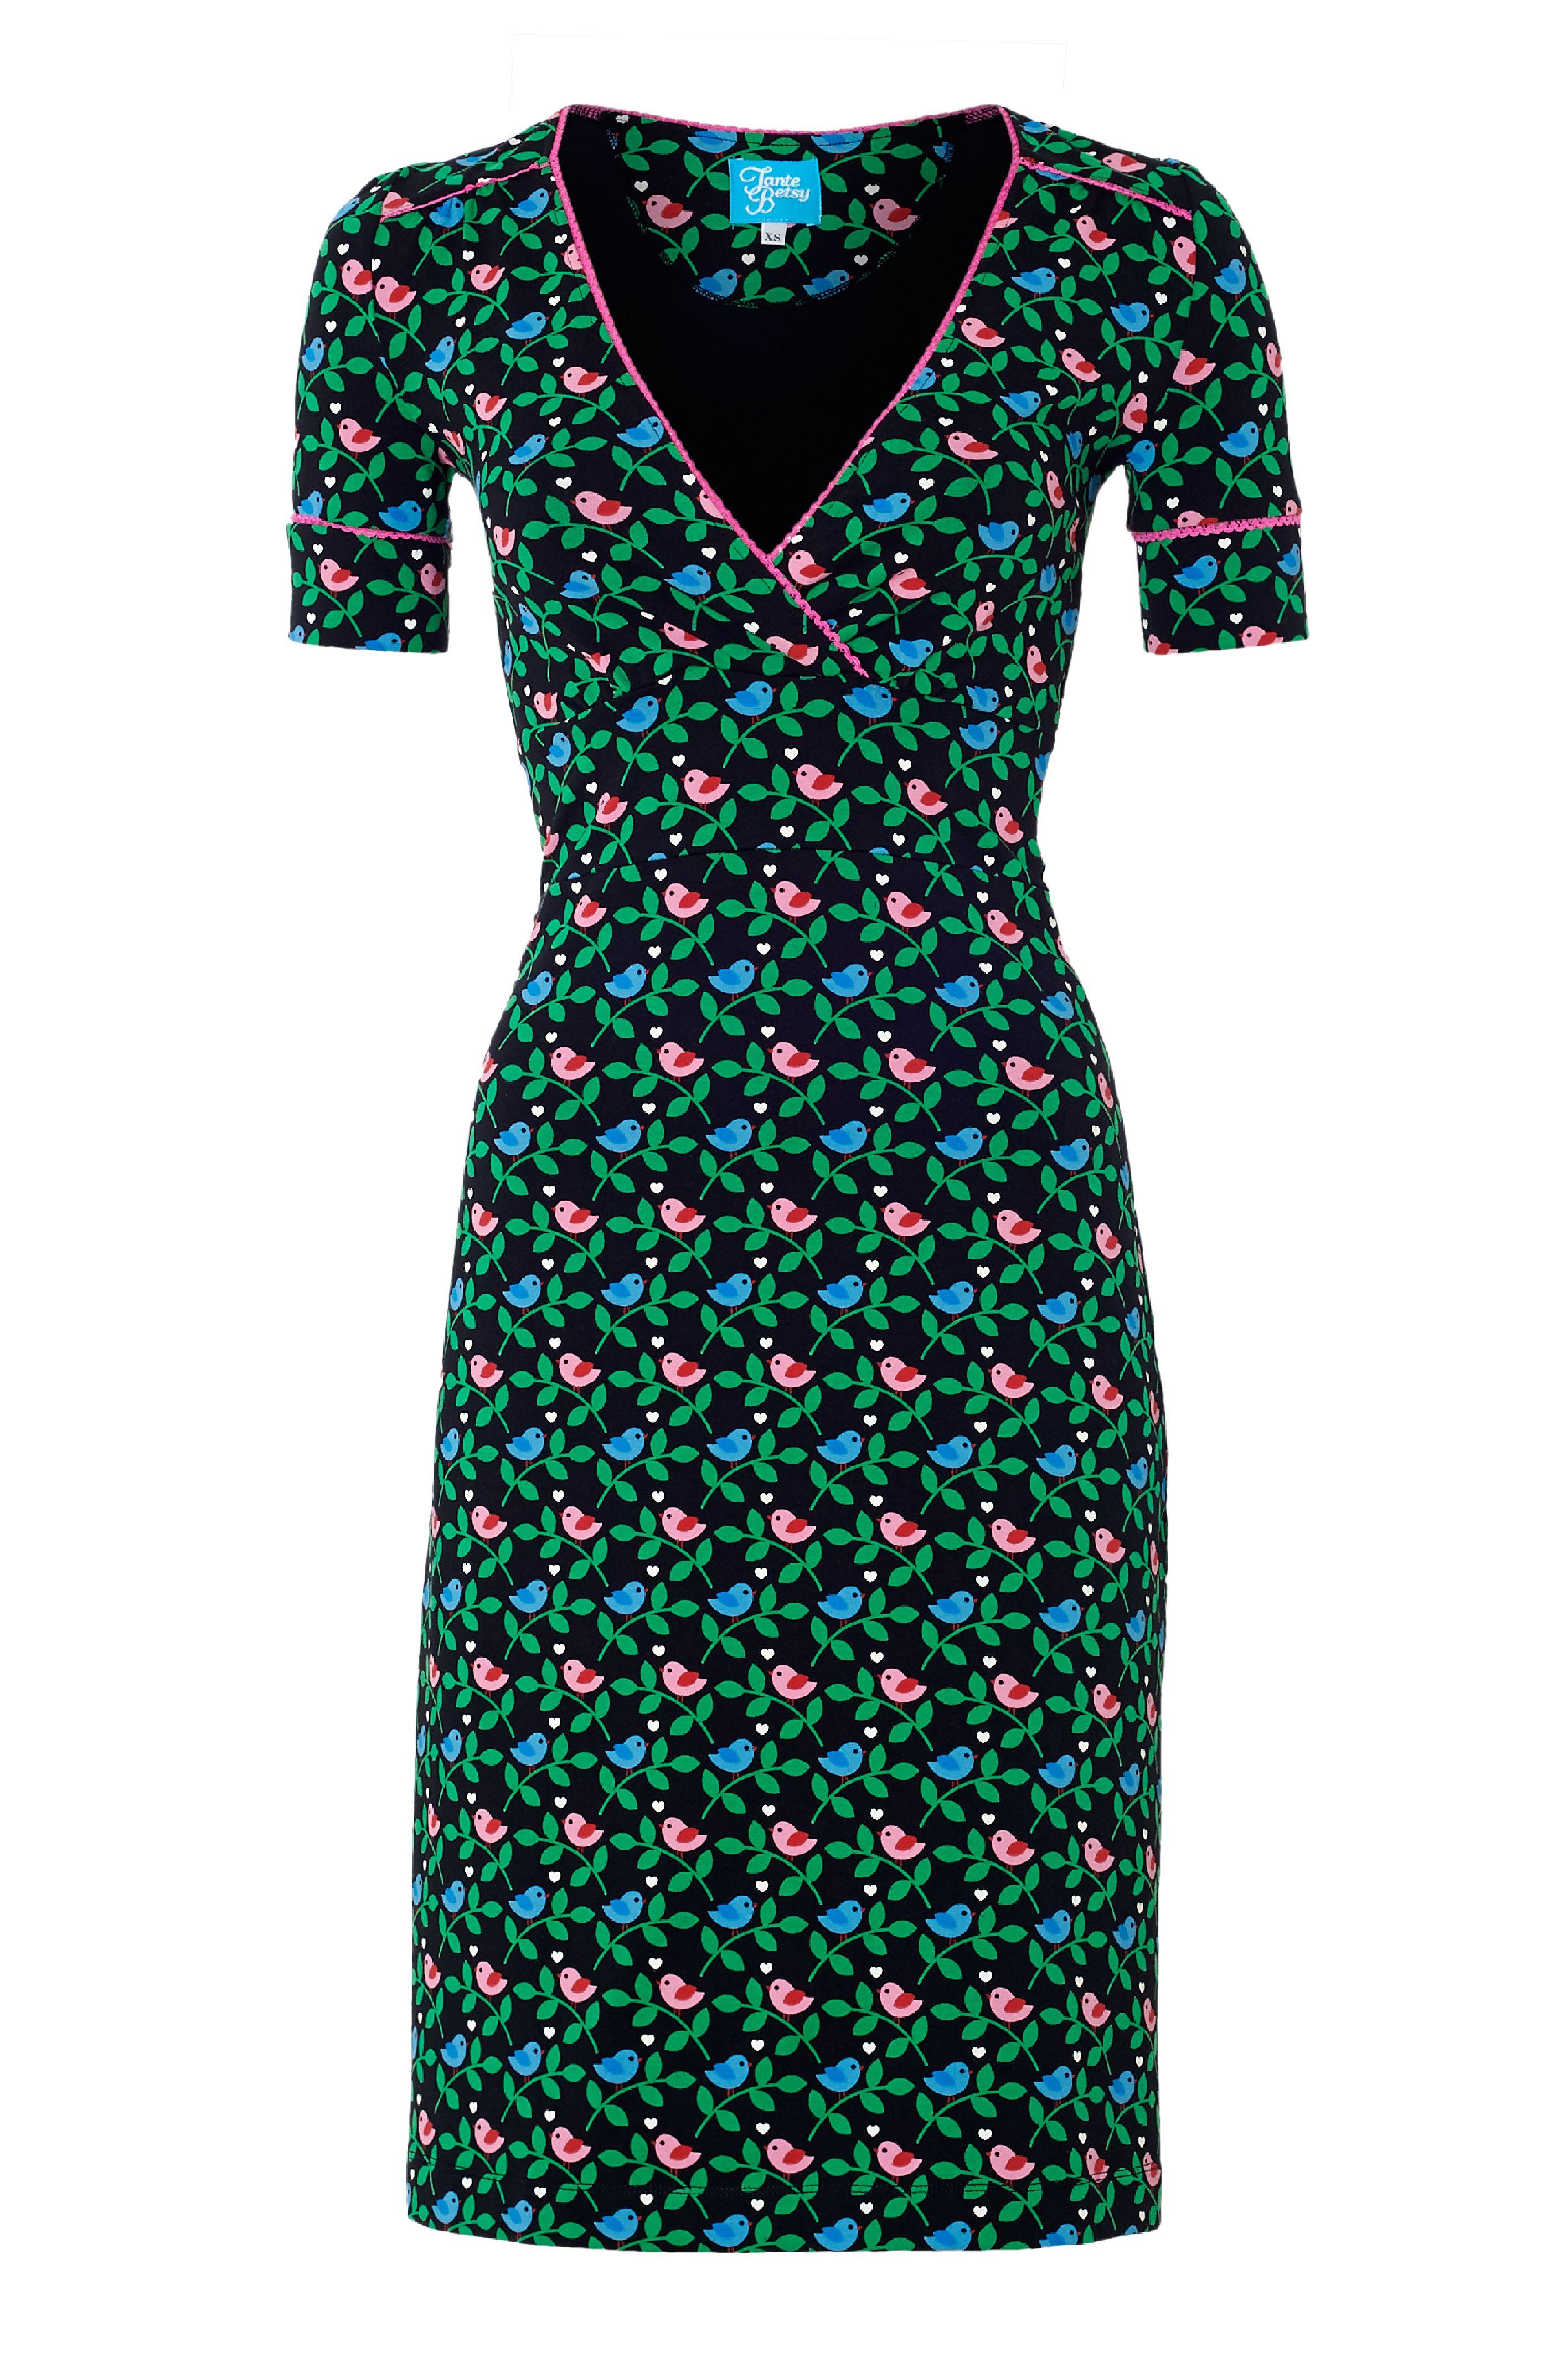 M Kleider Romantic Damen King Louie Schwarz Rose Dress Kleider Langarm Gr Kleidung & Accessoires